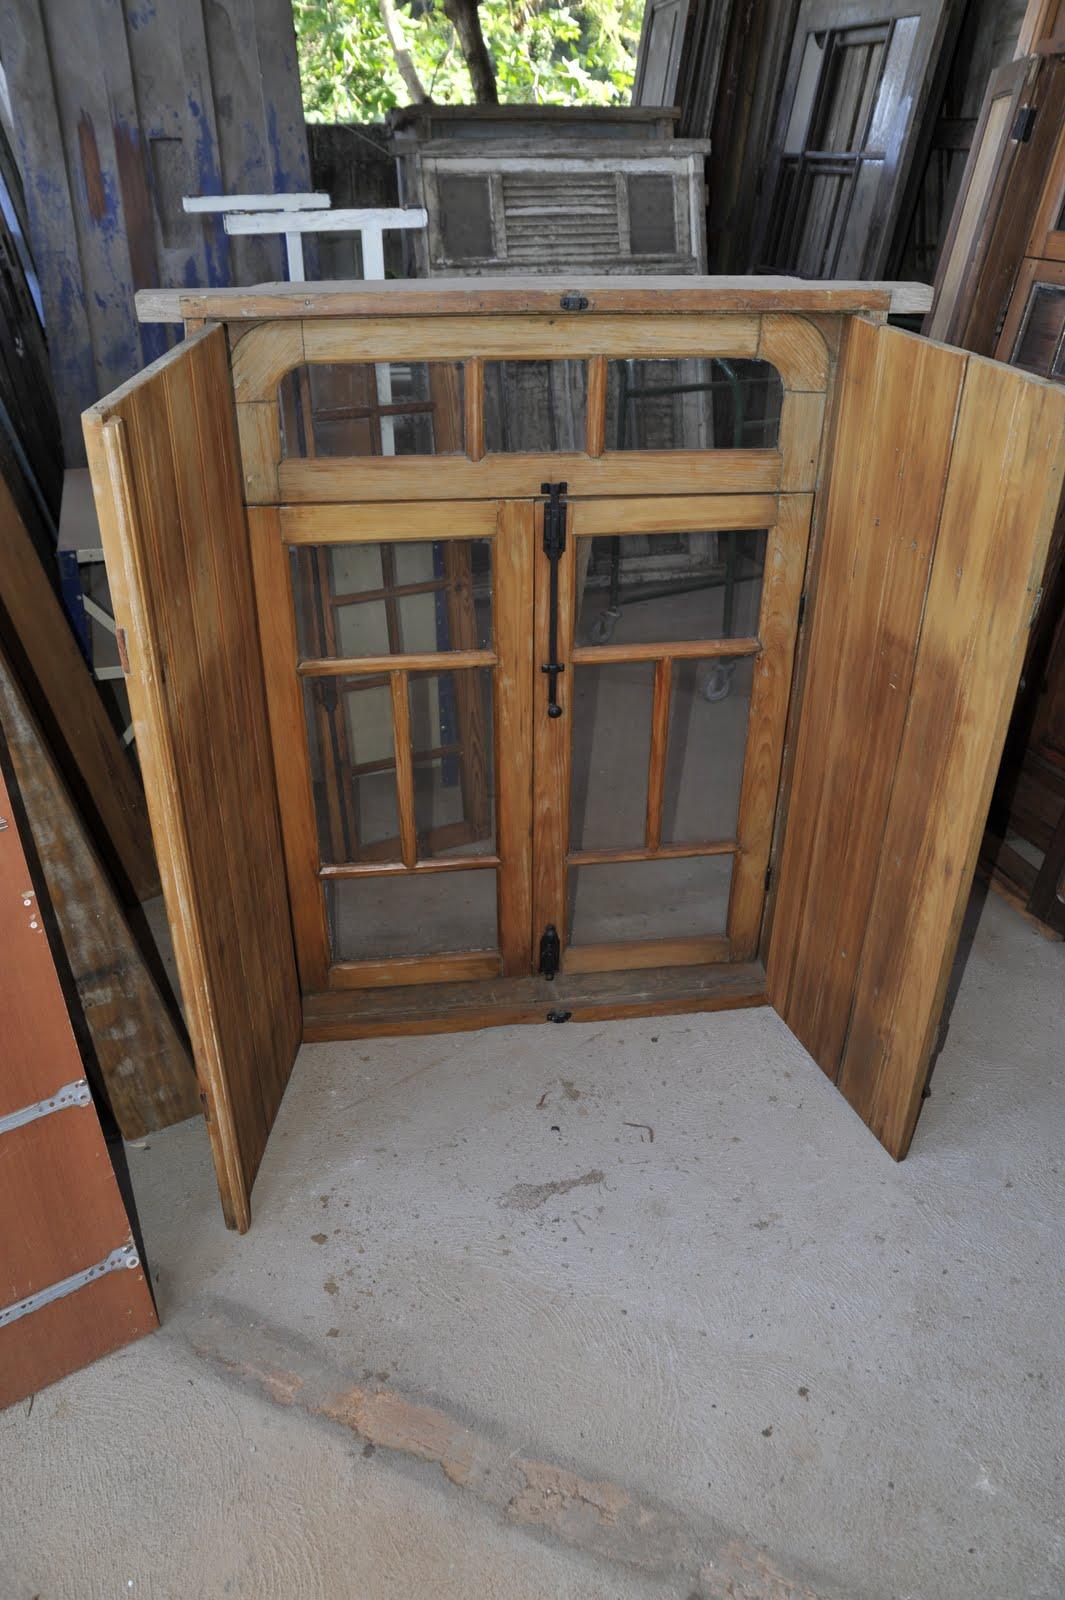 #82903B Portas e Janelas Antigas: Compra e Venda de porta e janelas antigas. 1252 Portas E Janelas Em Madeira De Lei